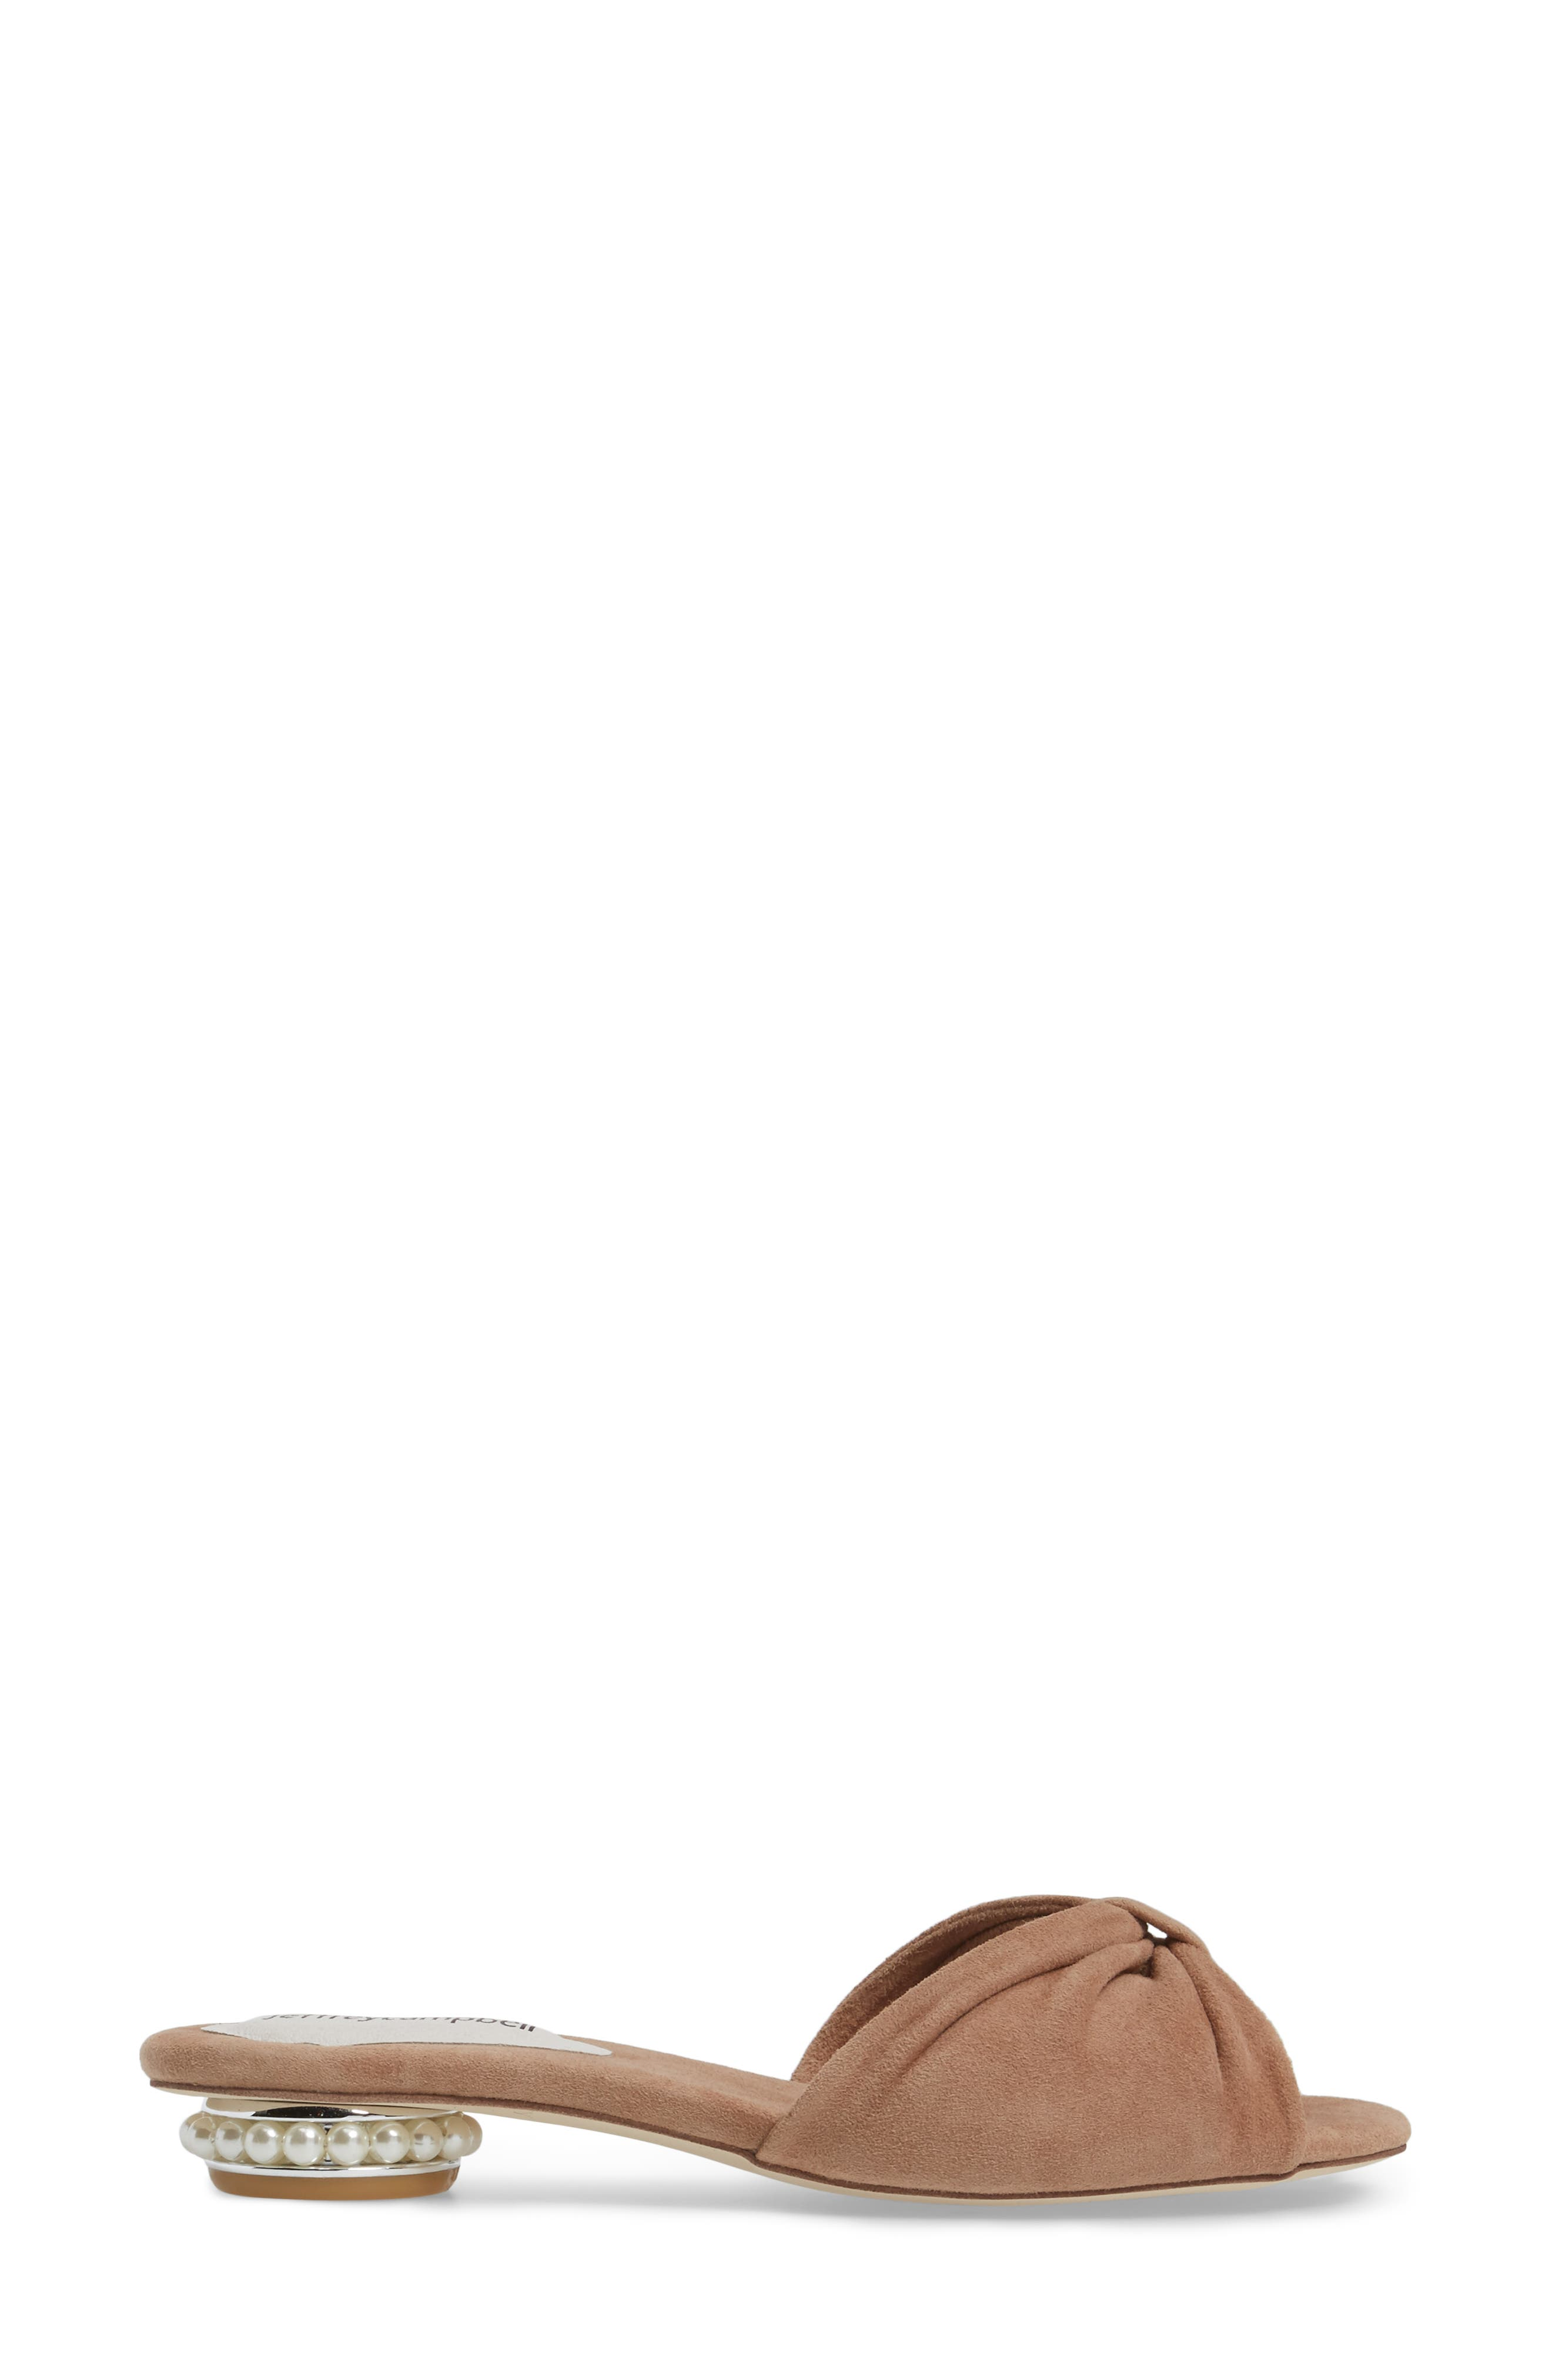 Alternate Image 3  - Jeffrey Campbell Turbina Embellished Slide Sandal (Women)